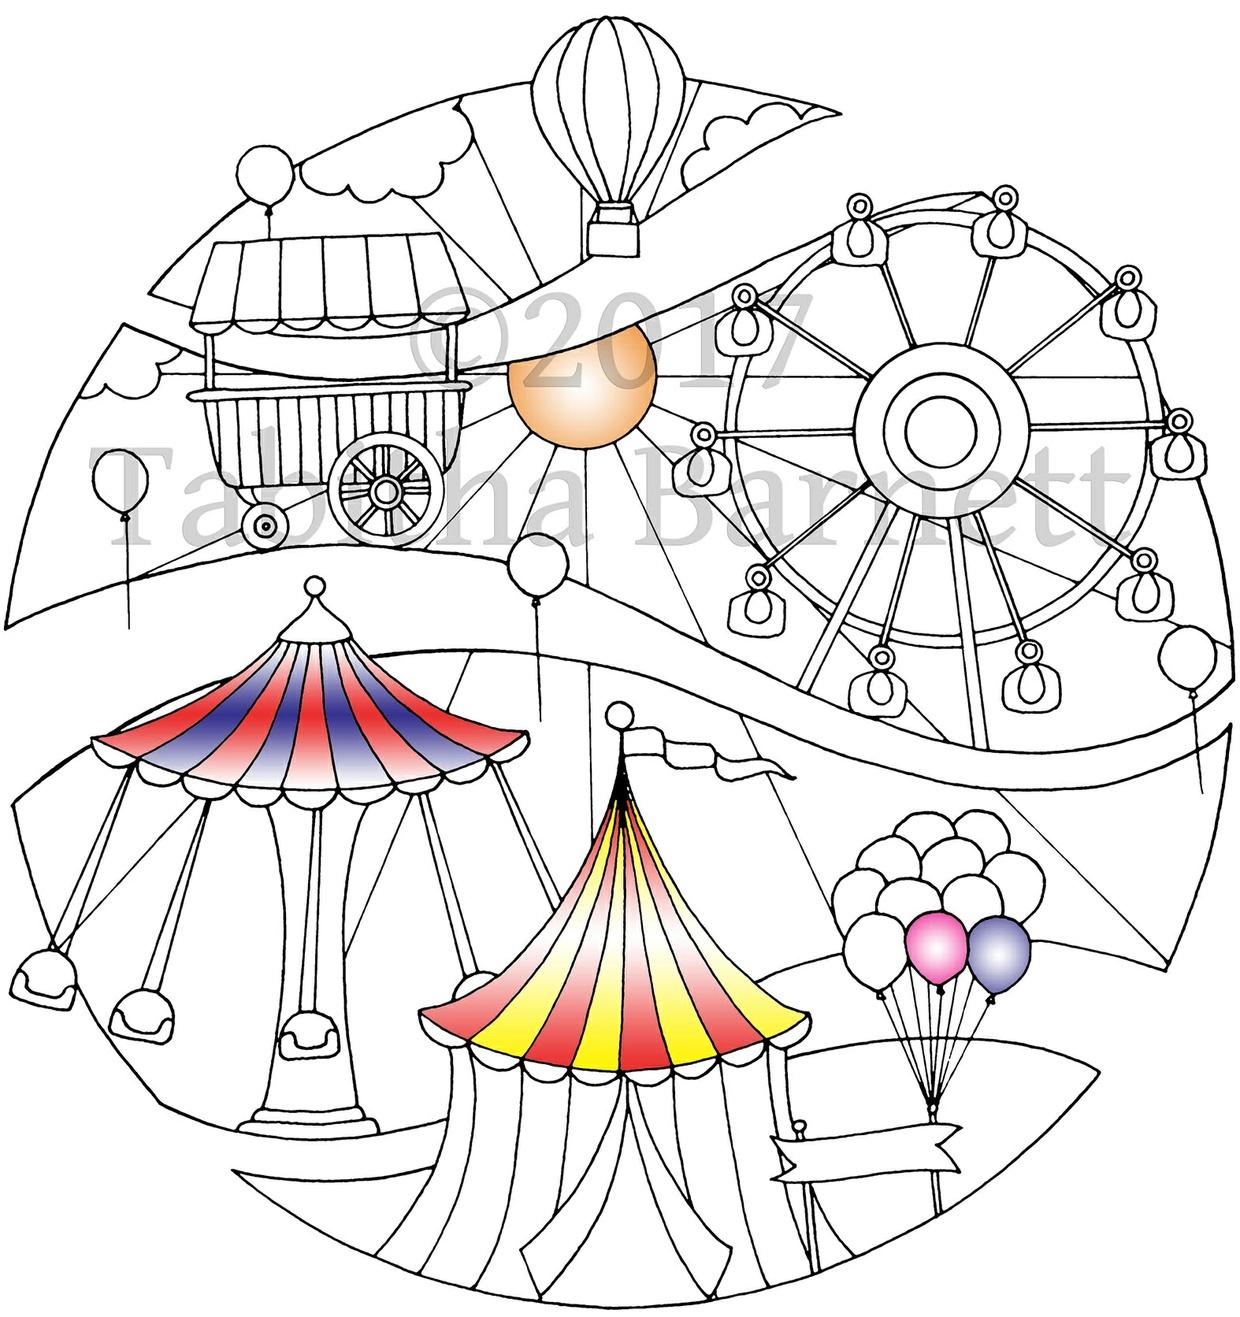 Broken Circles Coloring Pack #3 (3 page PDF)